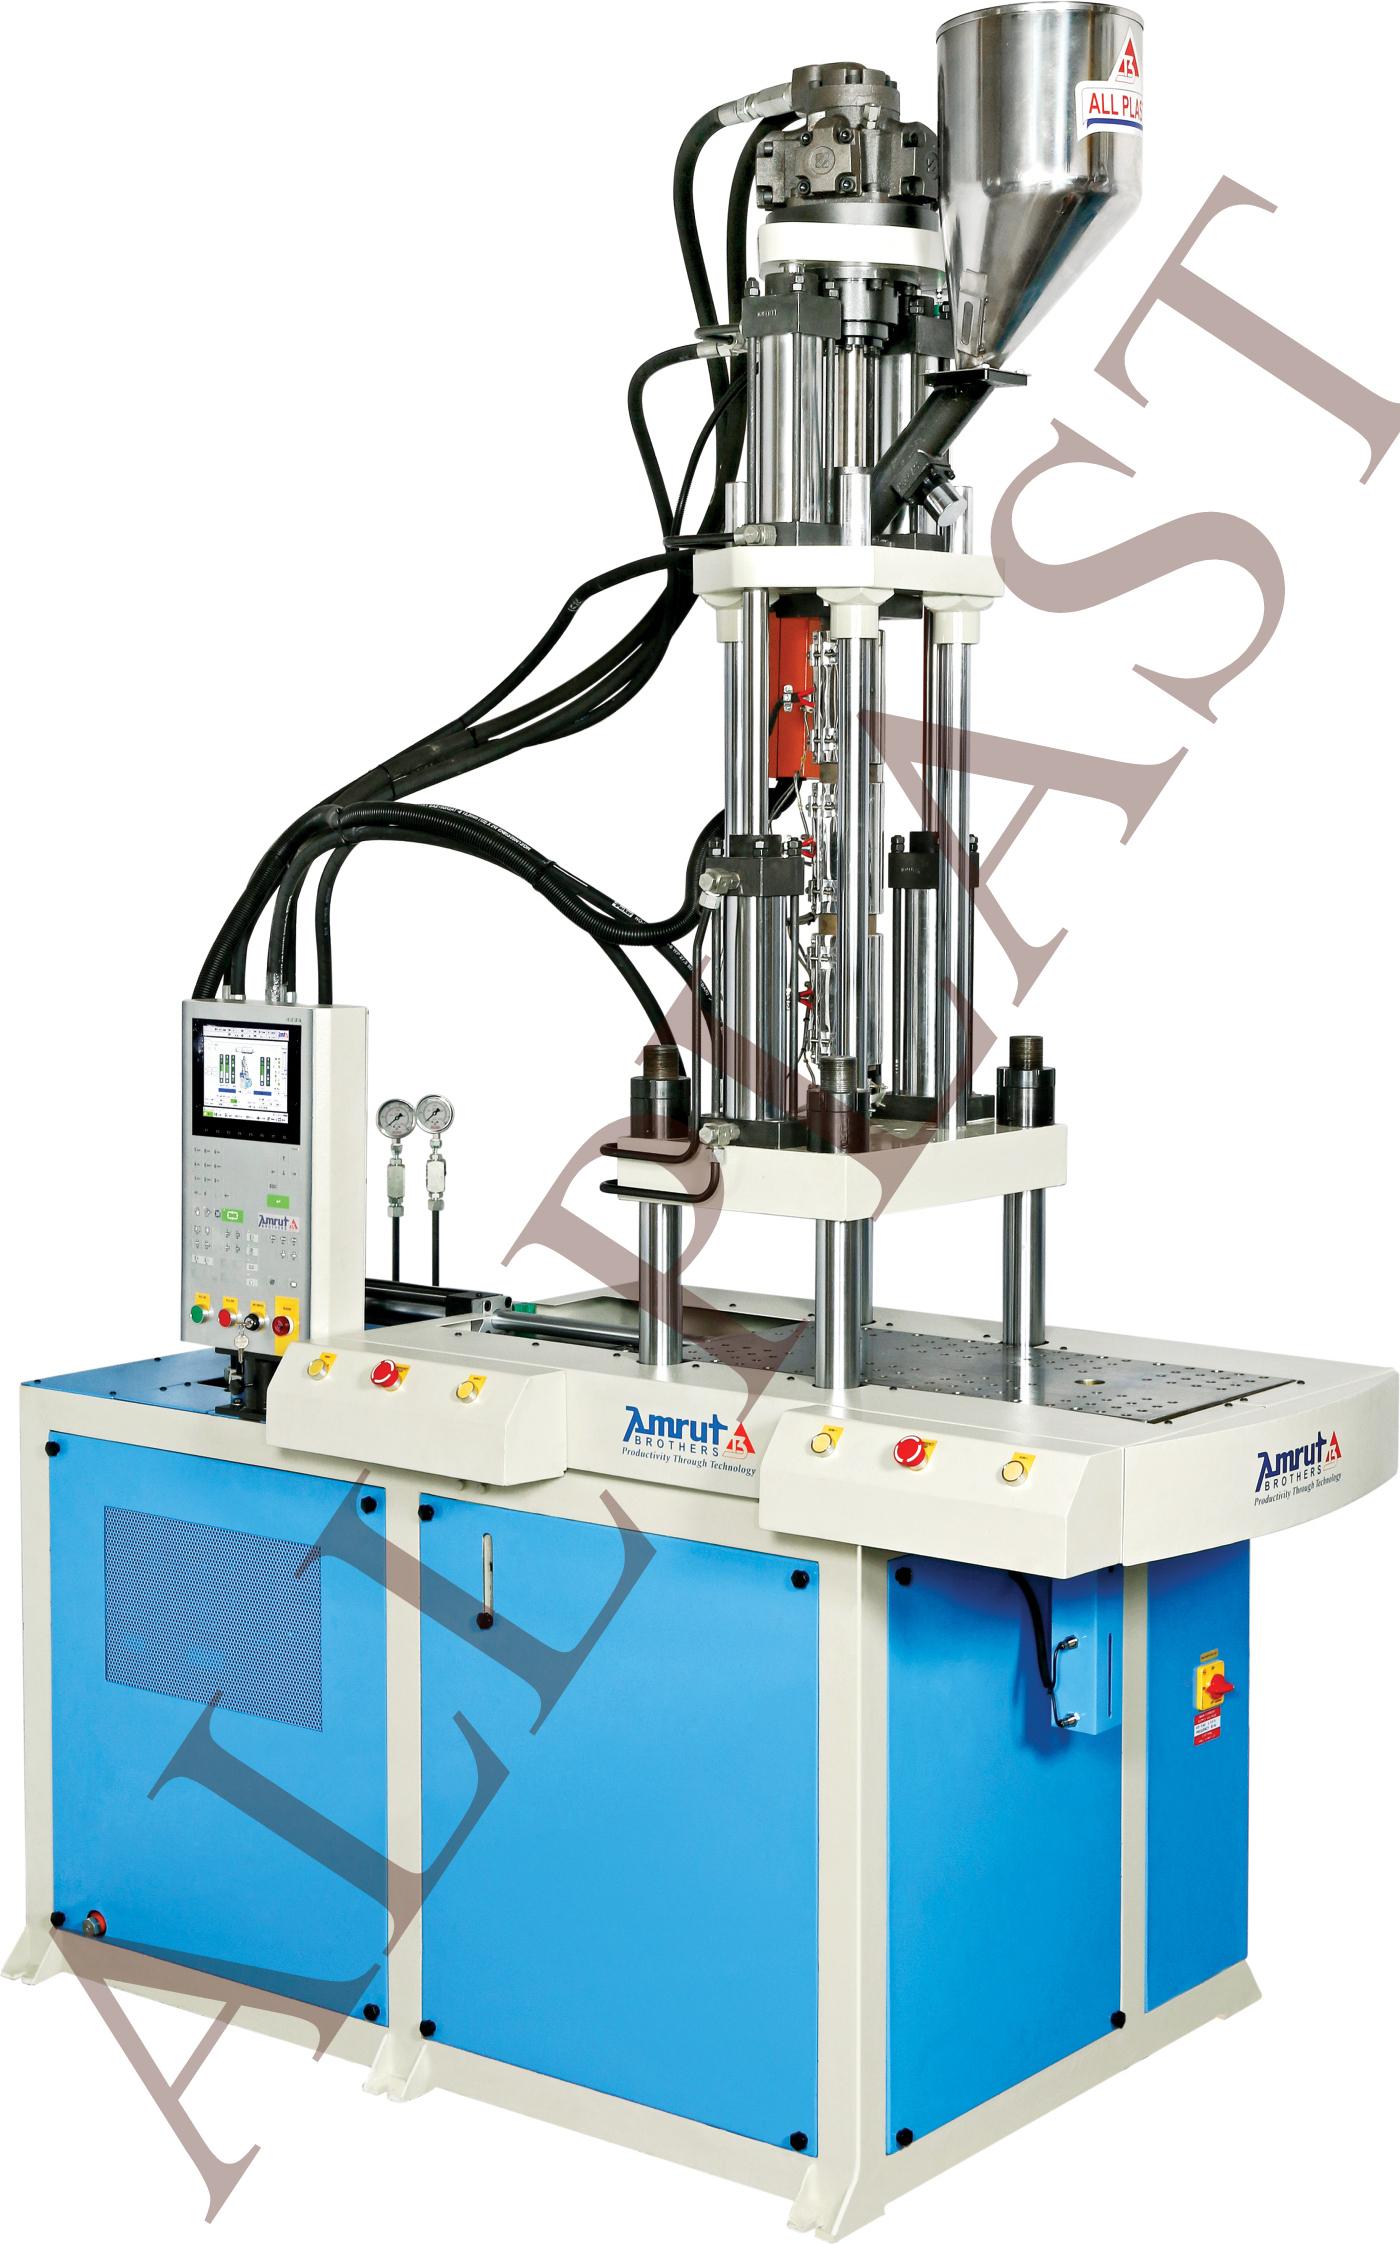 Single Slide Vertical Injection Moulding Machine